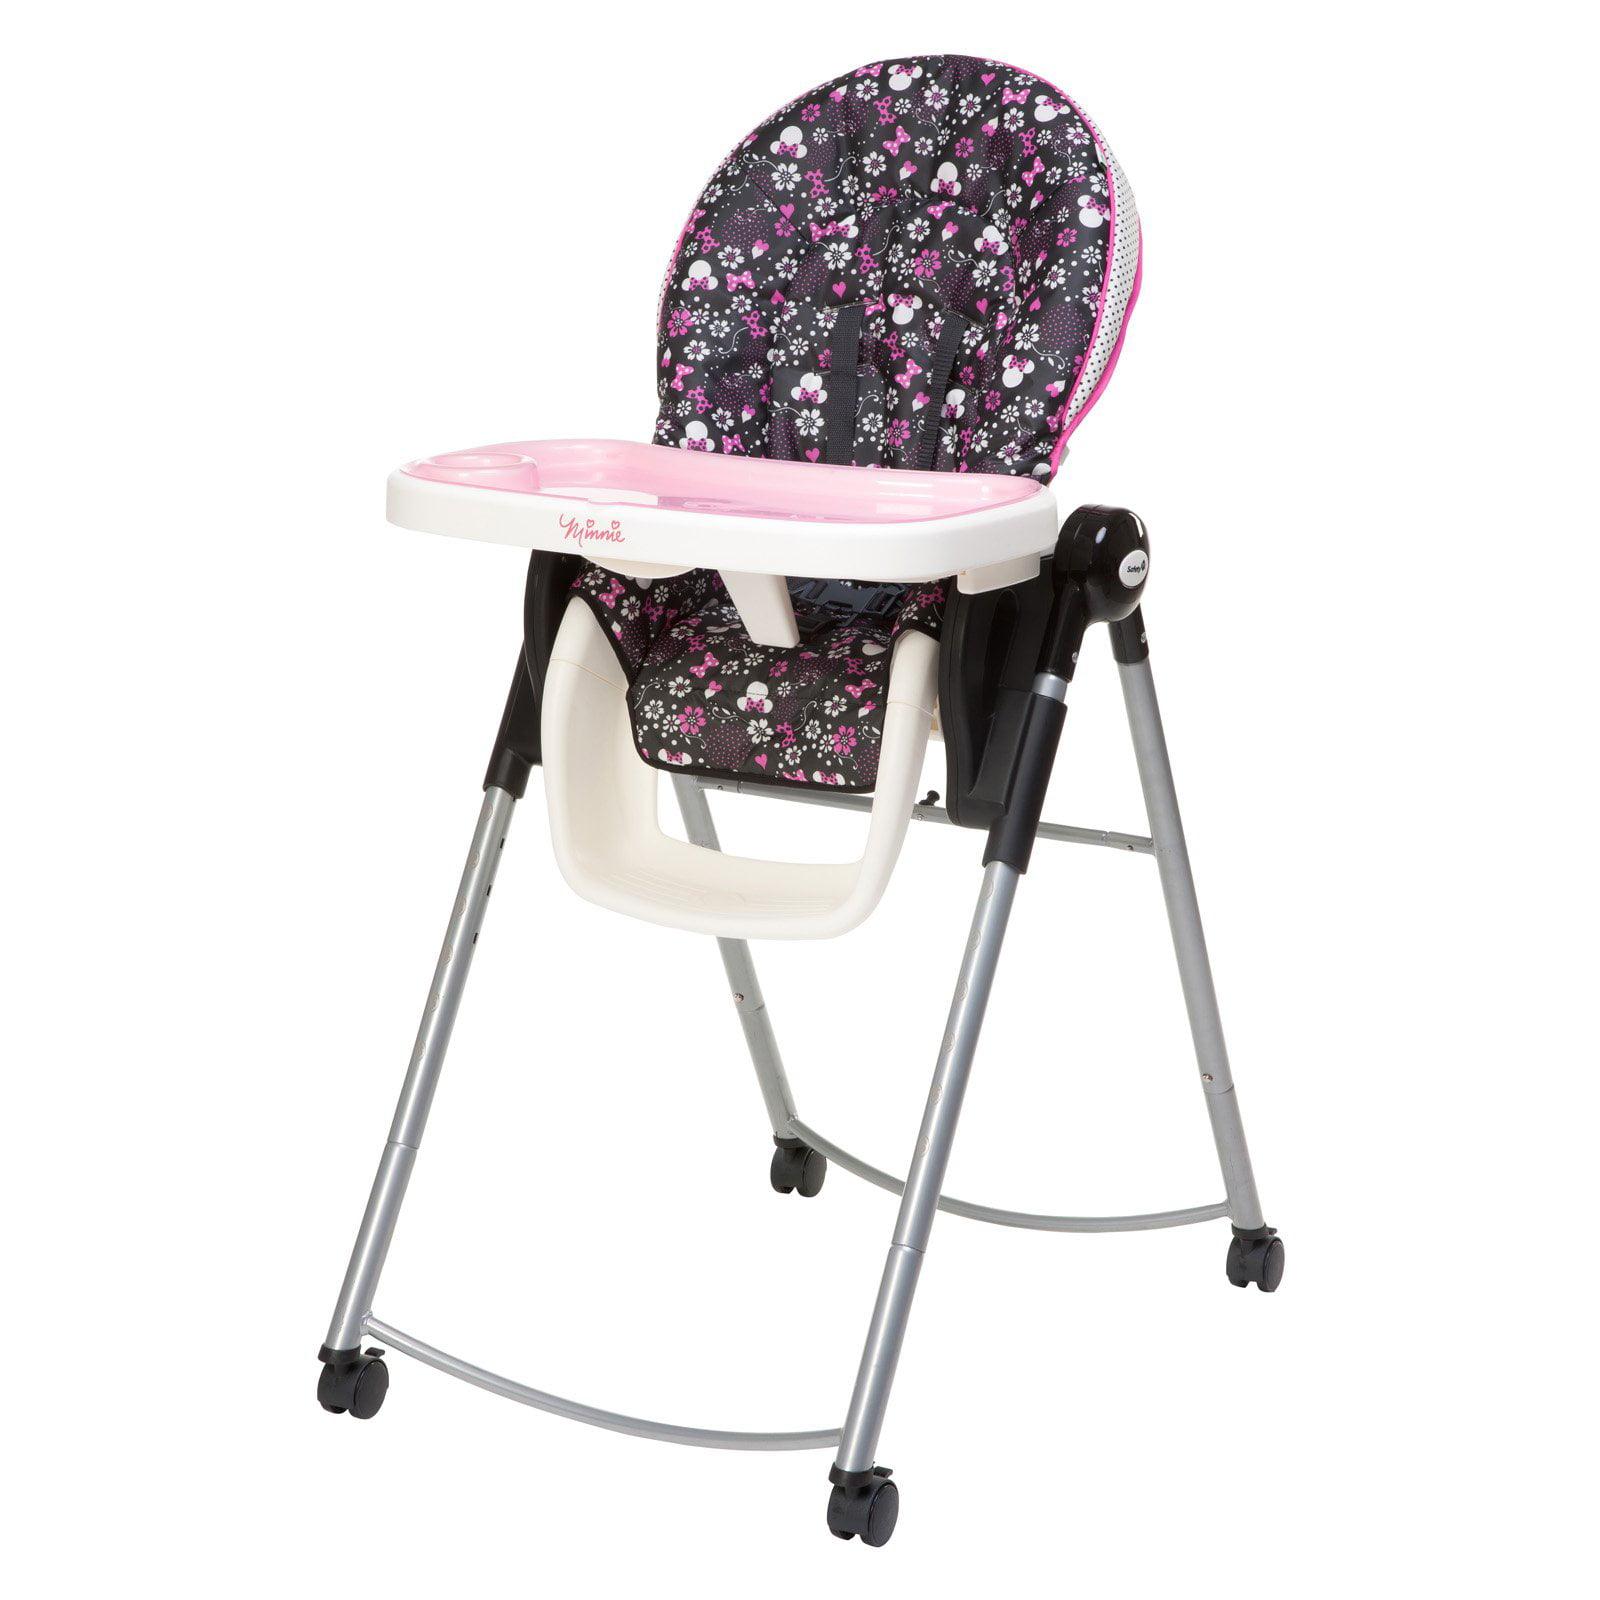 Disney Baby Adjustable High Chair Minnie Pop by Disney